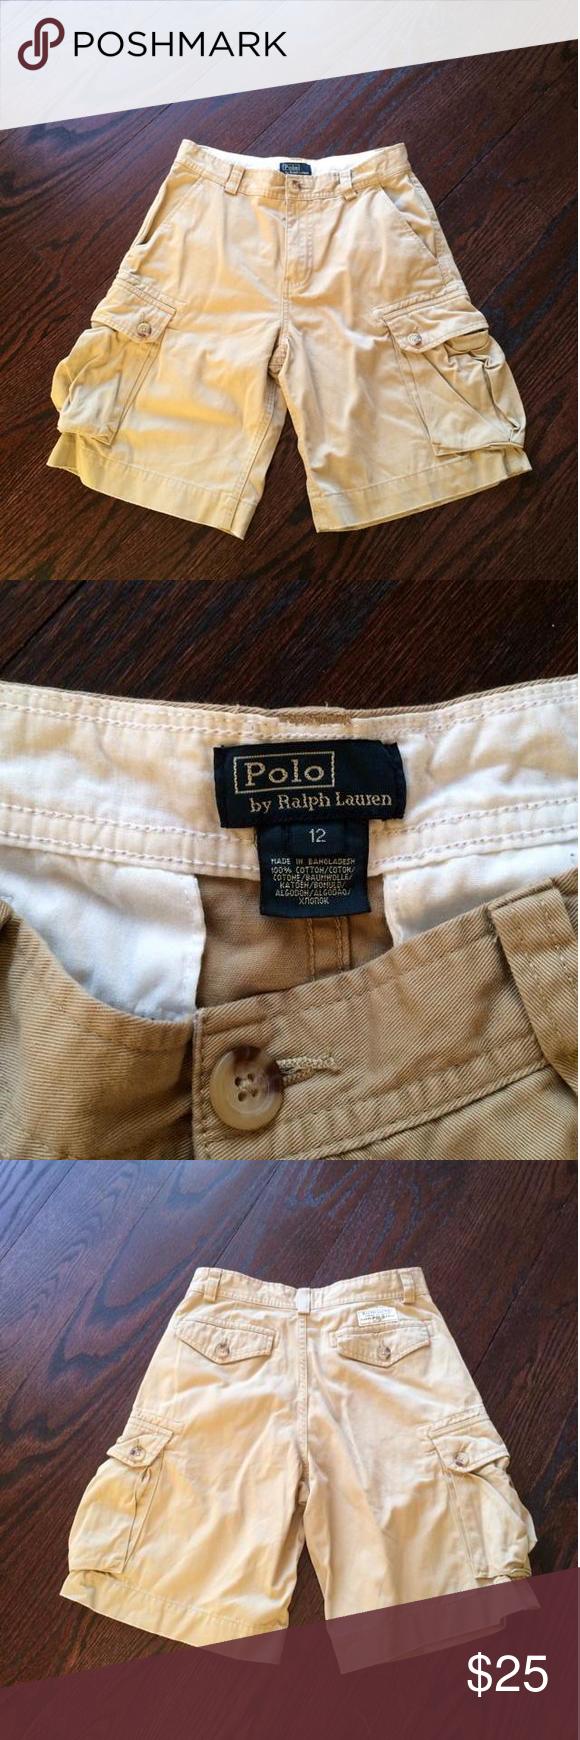 Polo Ralph Lauren beige cargo shorts Polo ralph lauren beige cargo shorts, size 12 Ralph Lauren Bottoms Shorts